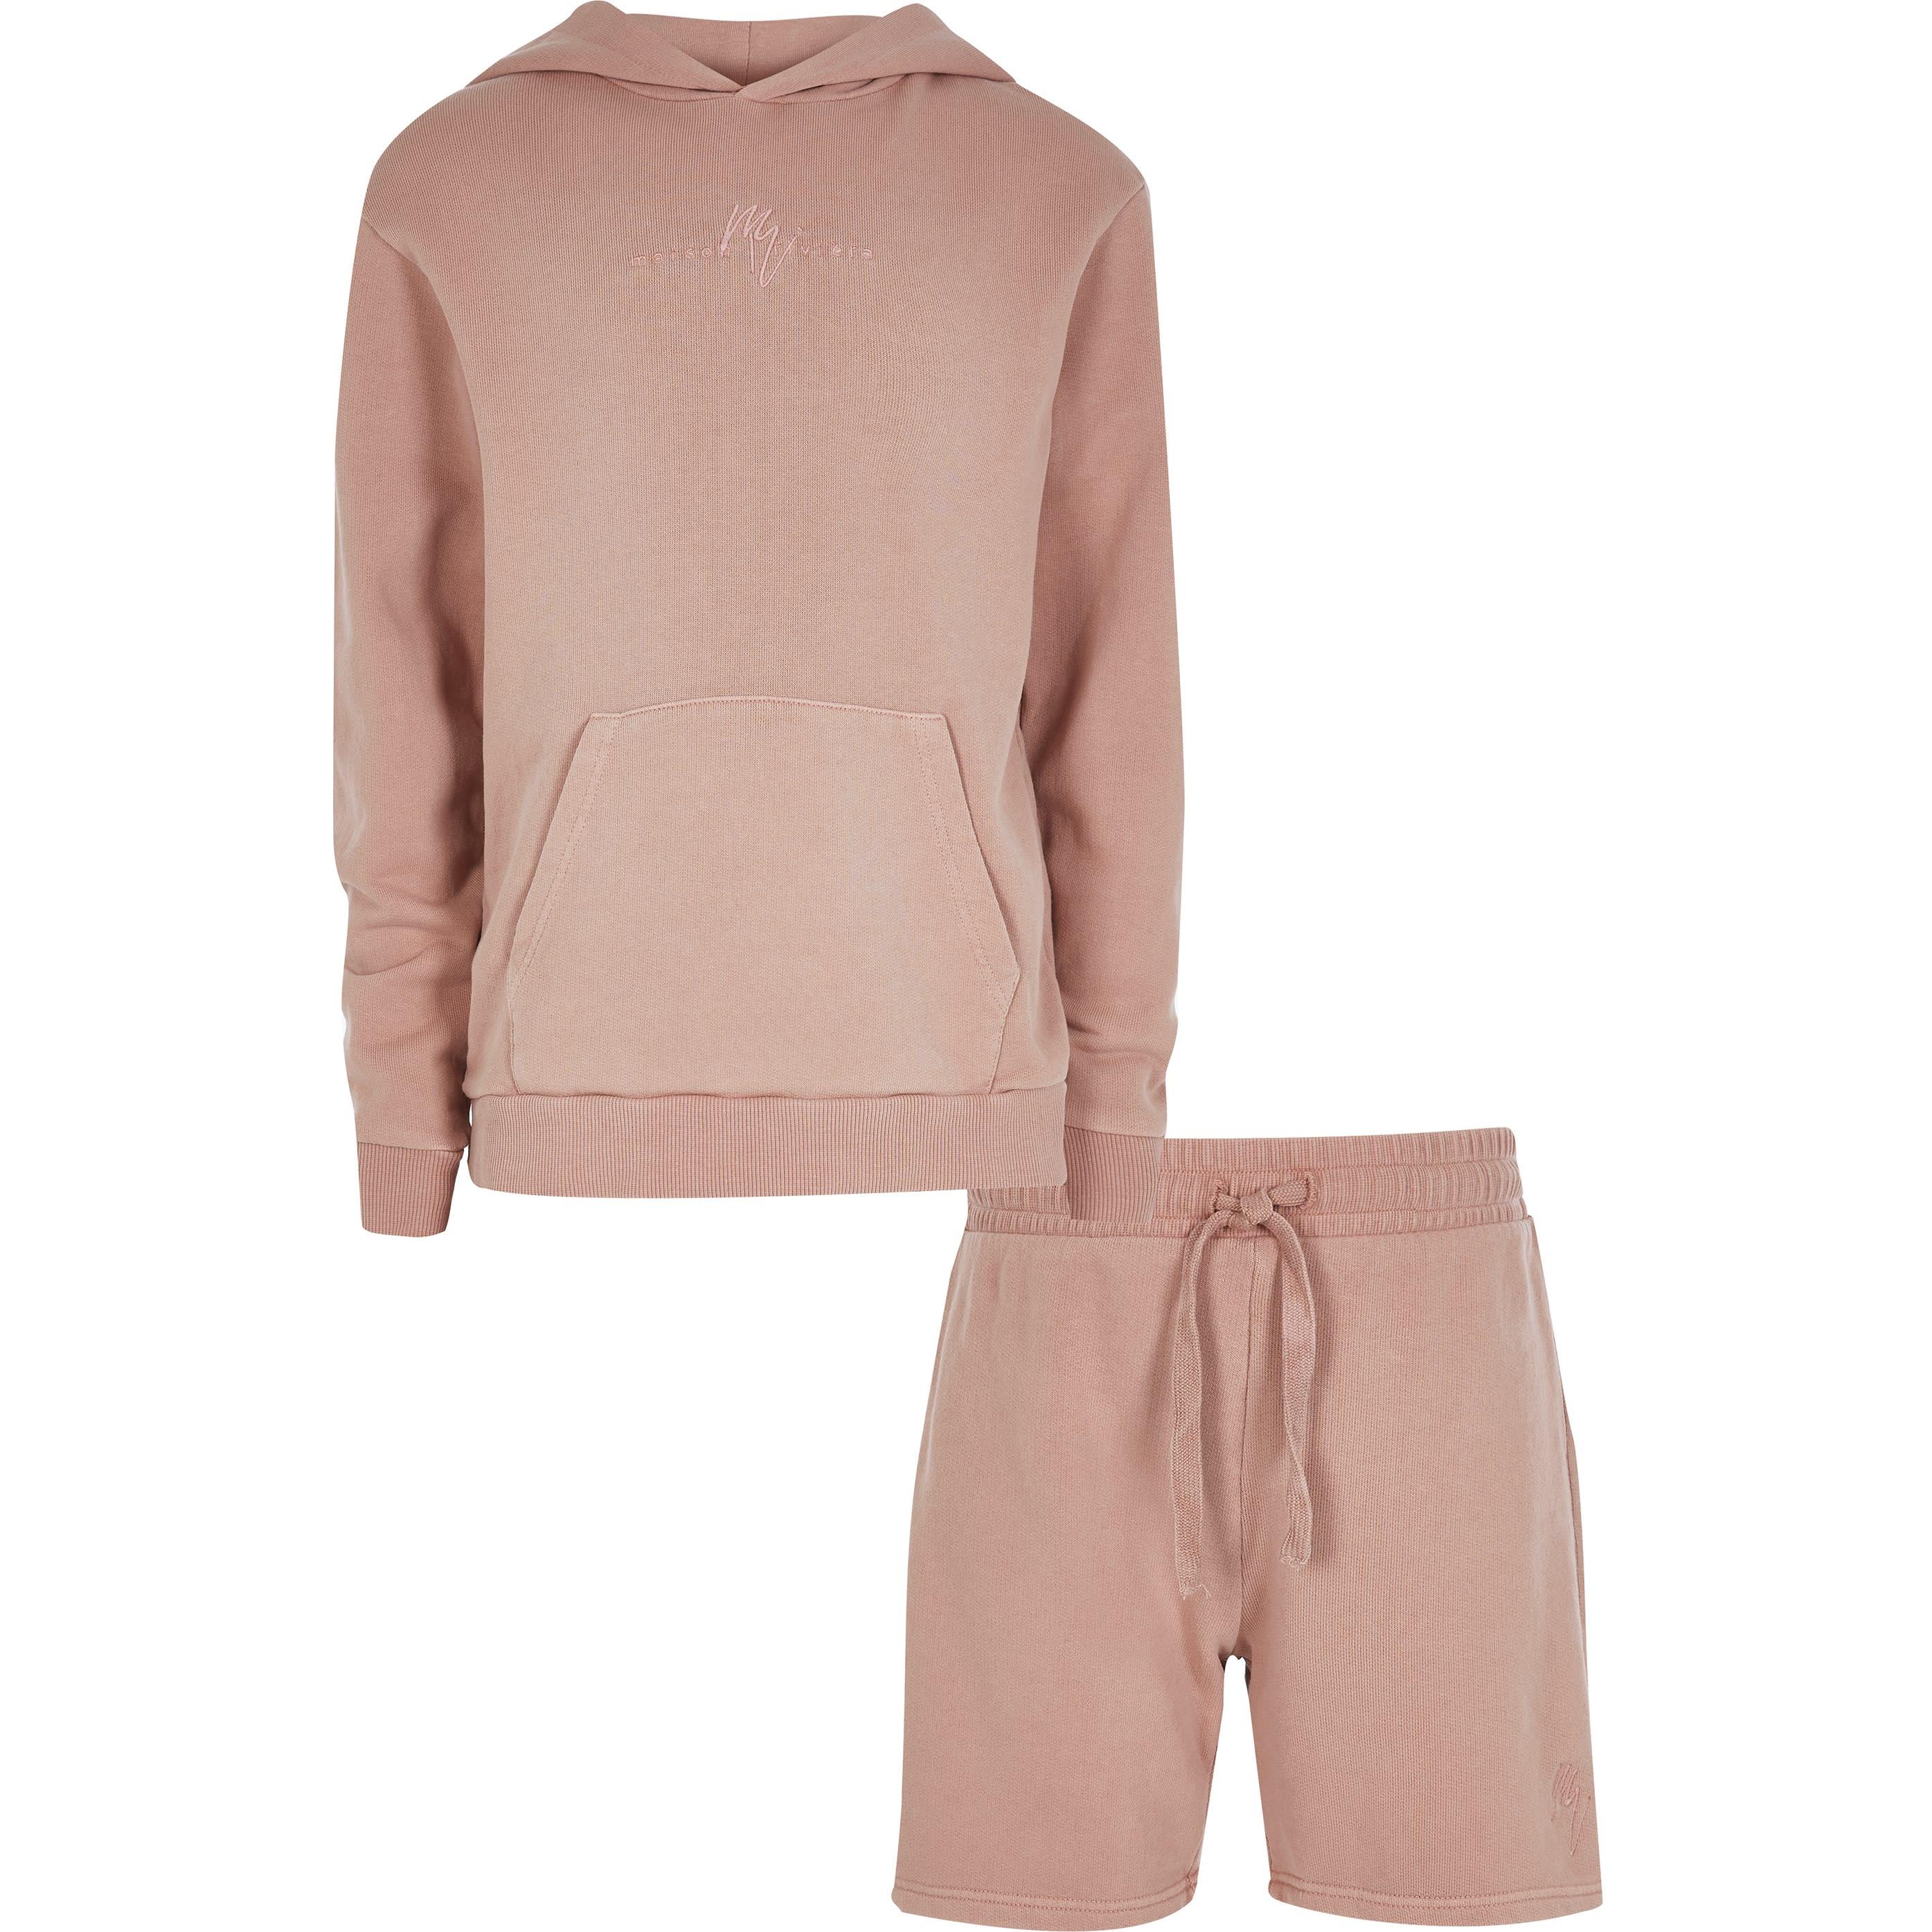 river island Boys Pink washed Hoody Set (5-6 Yrs)